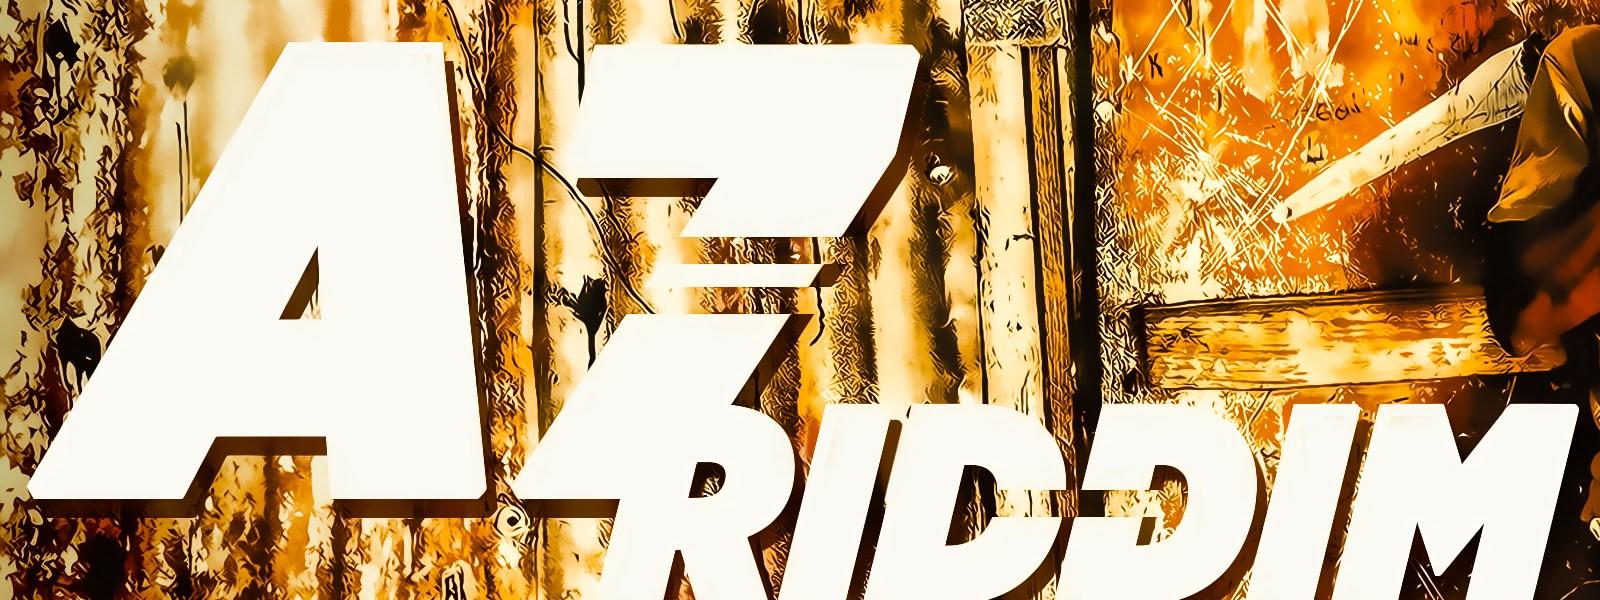 A7 Riddim